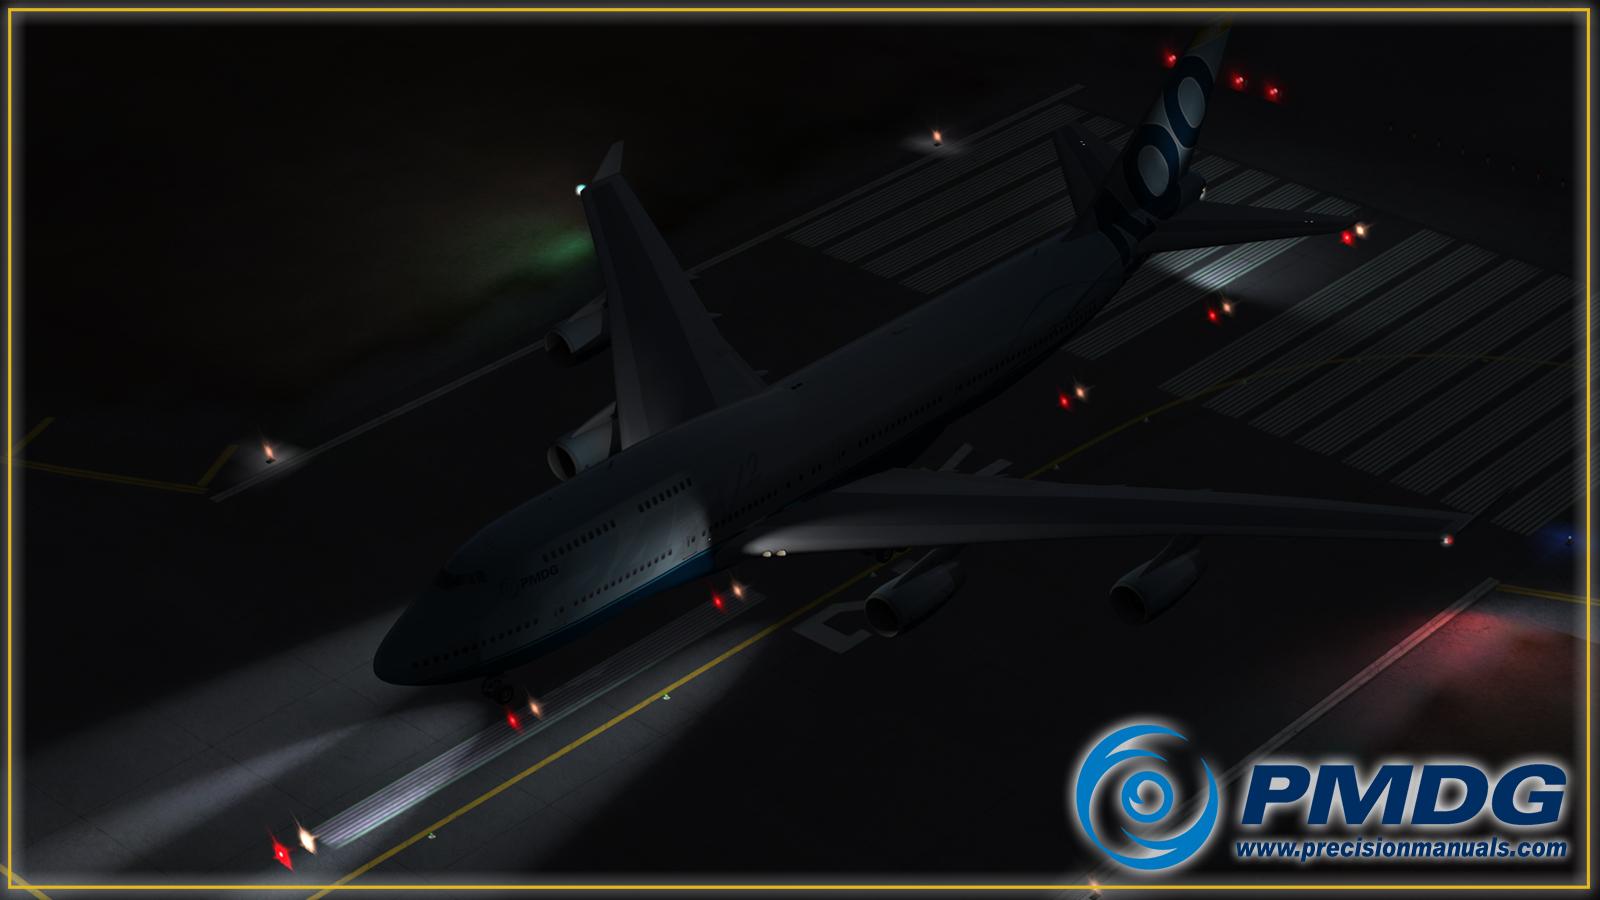 pmdg_744RR_nightlighting_1.jpg